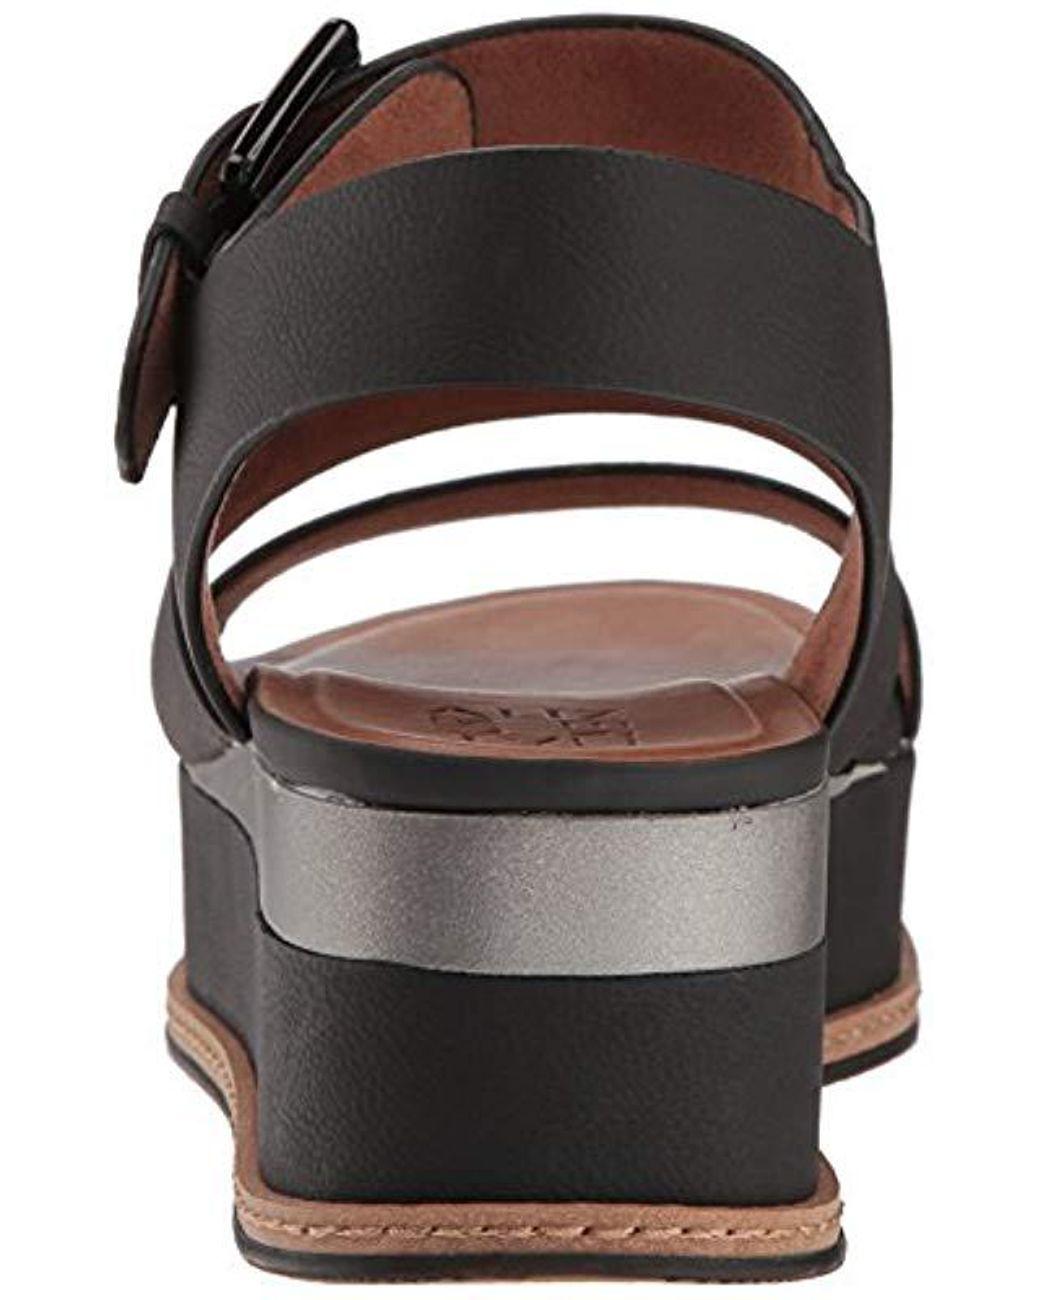 41317e8ab6e Lyst - Naturalizer Billie Espadrille Wedge Sandal in Black - Save 40%